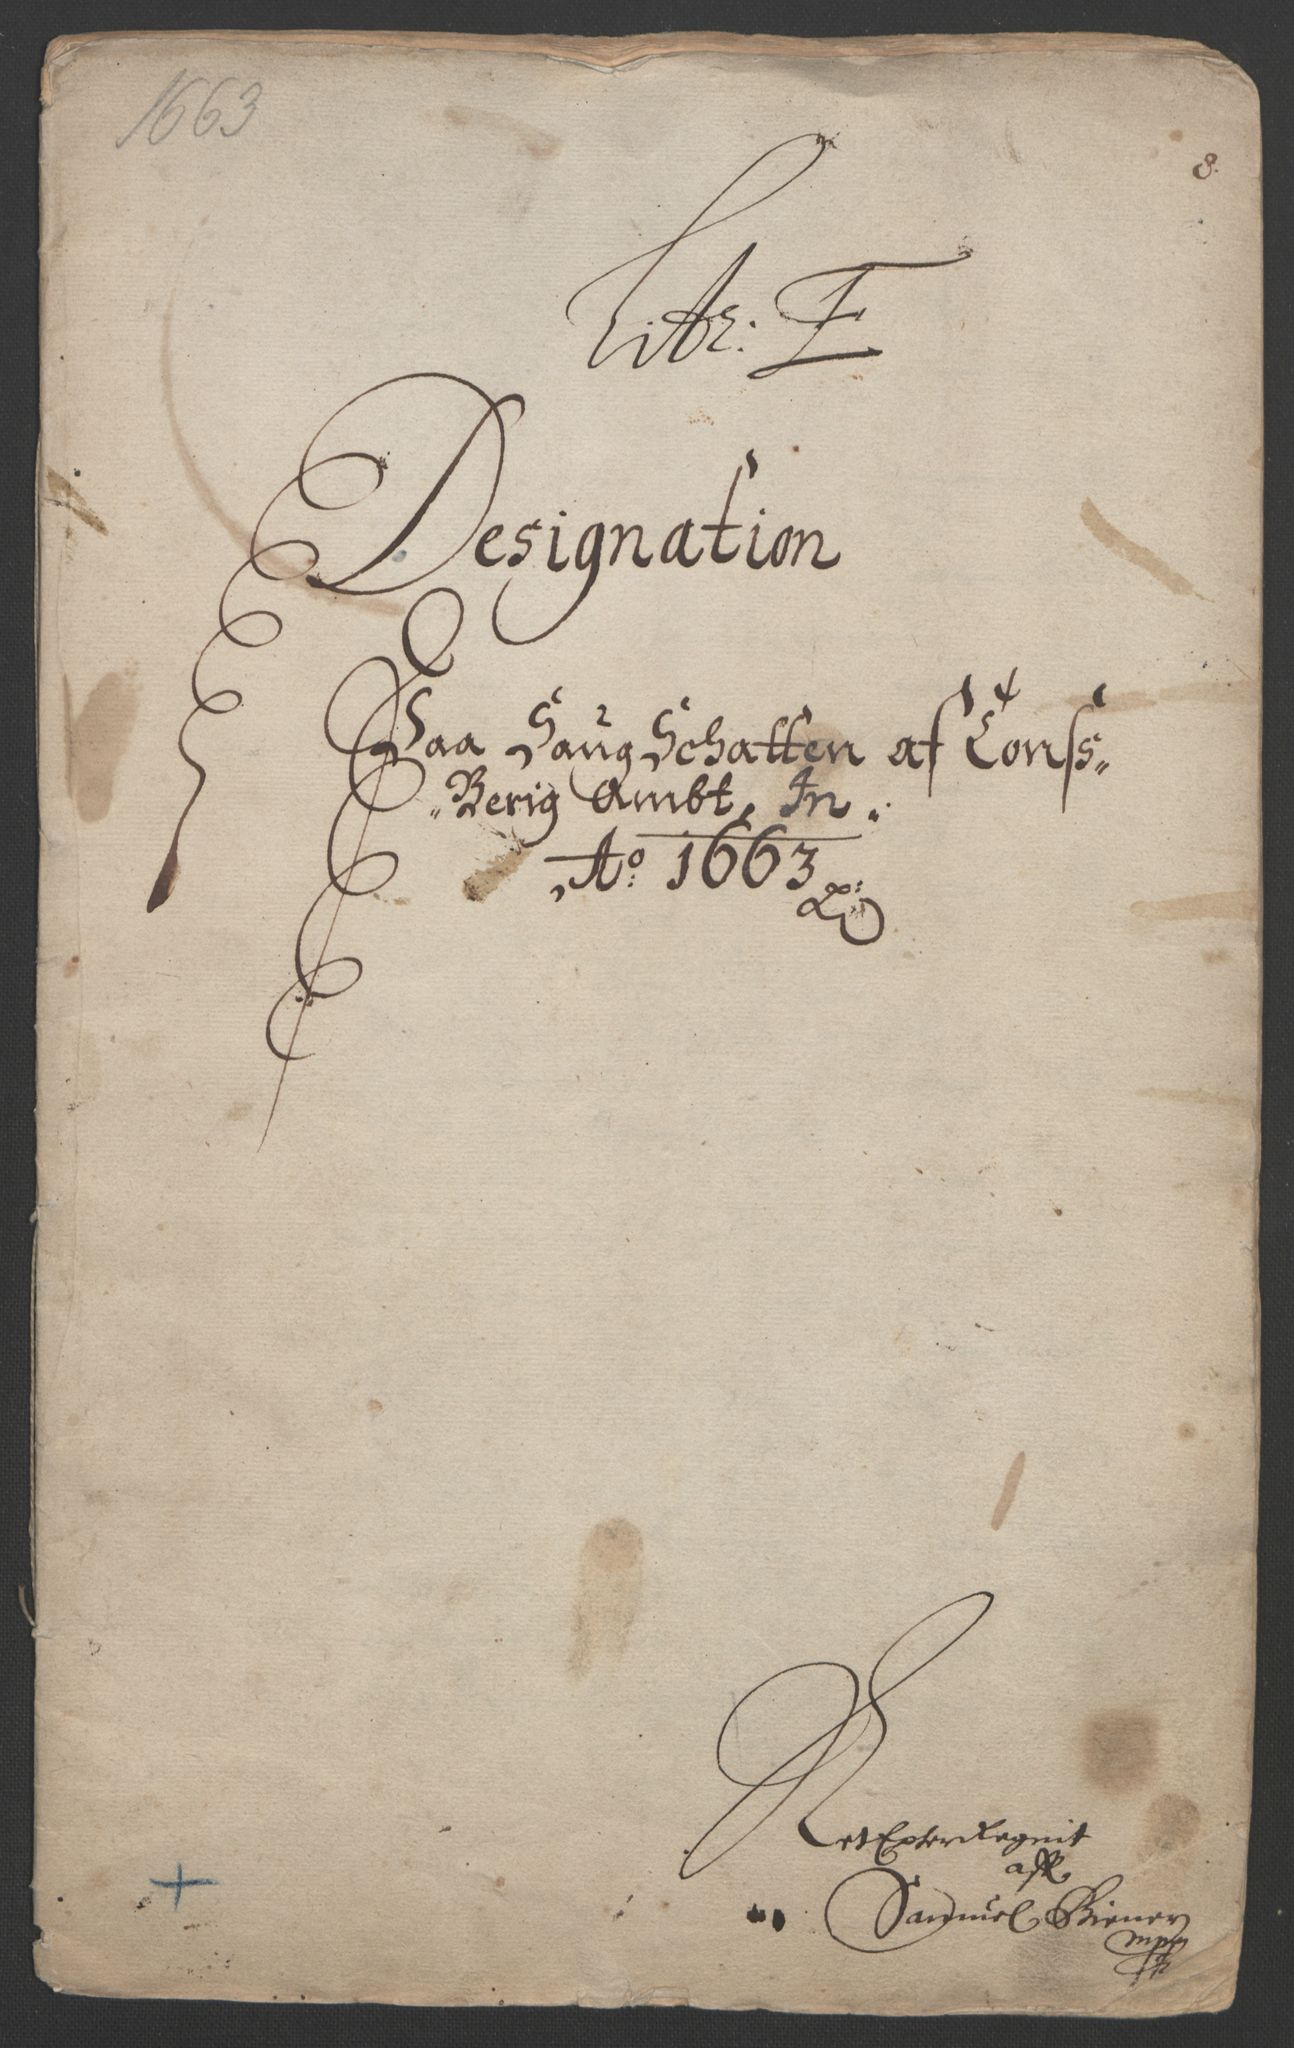 RA, Rentekammeret inntil 1814, Reviderte regnskaper, Fogderegnskap, R32/L1838: Fogderegnskap Jarlsberg grevskap, 1661-1663, s. 303